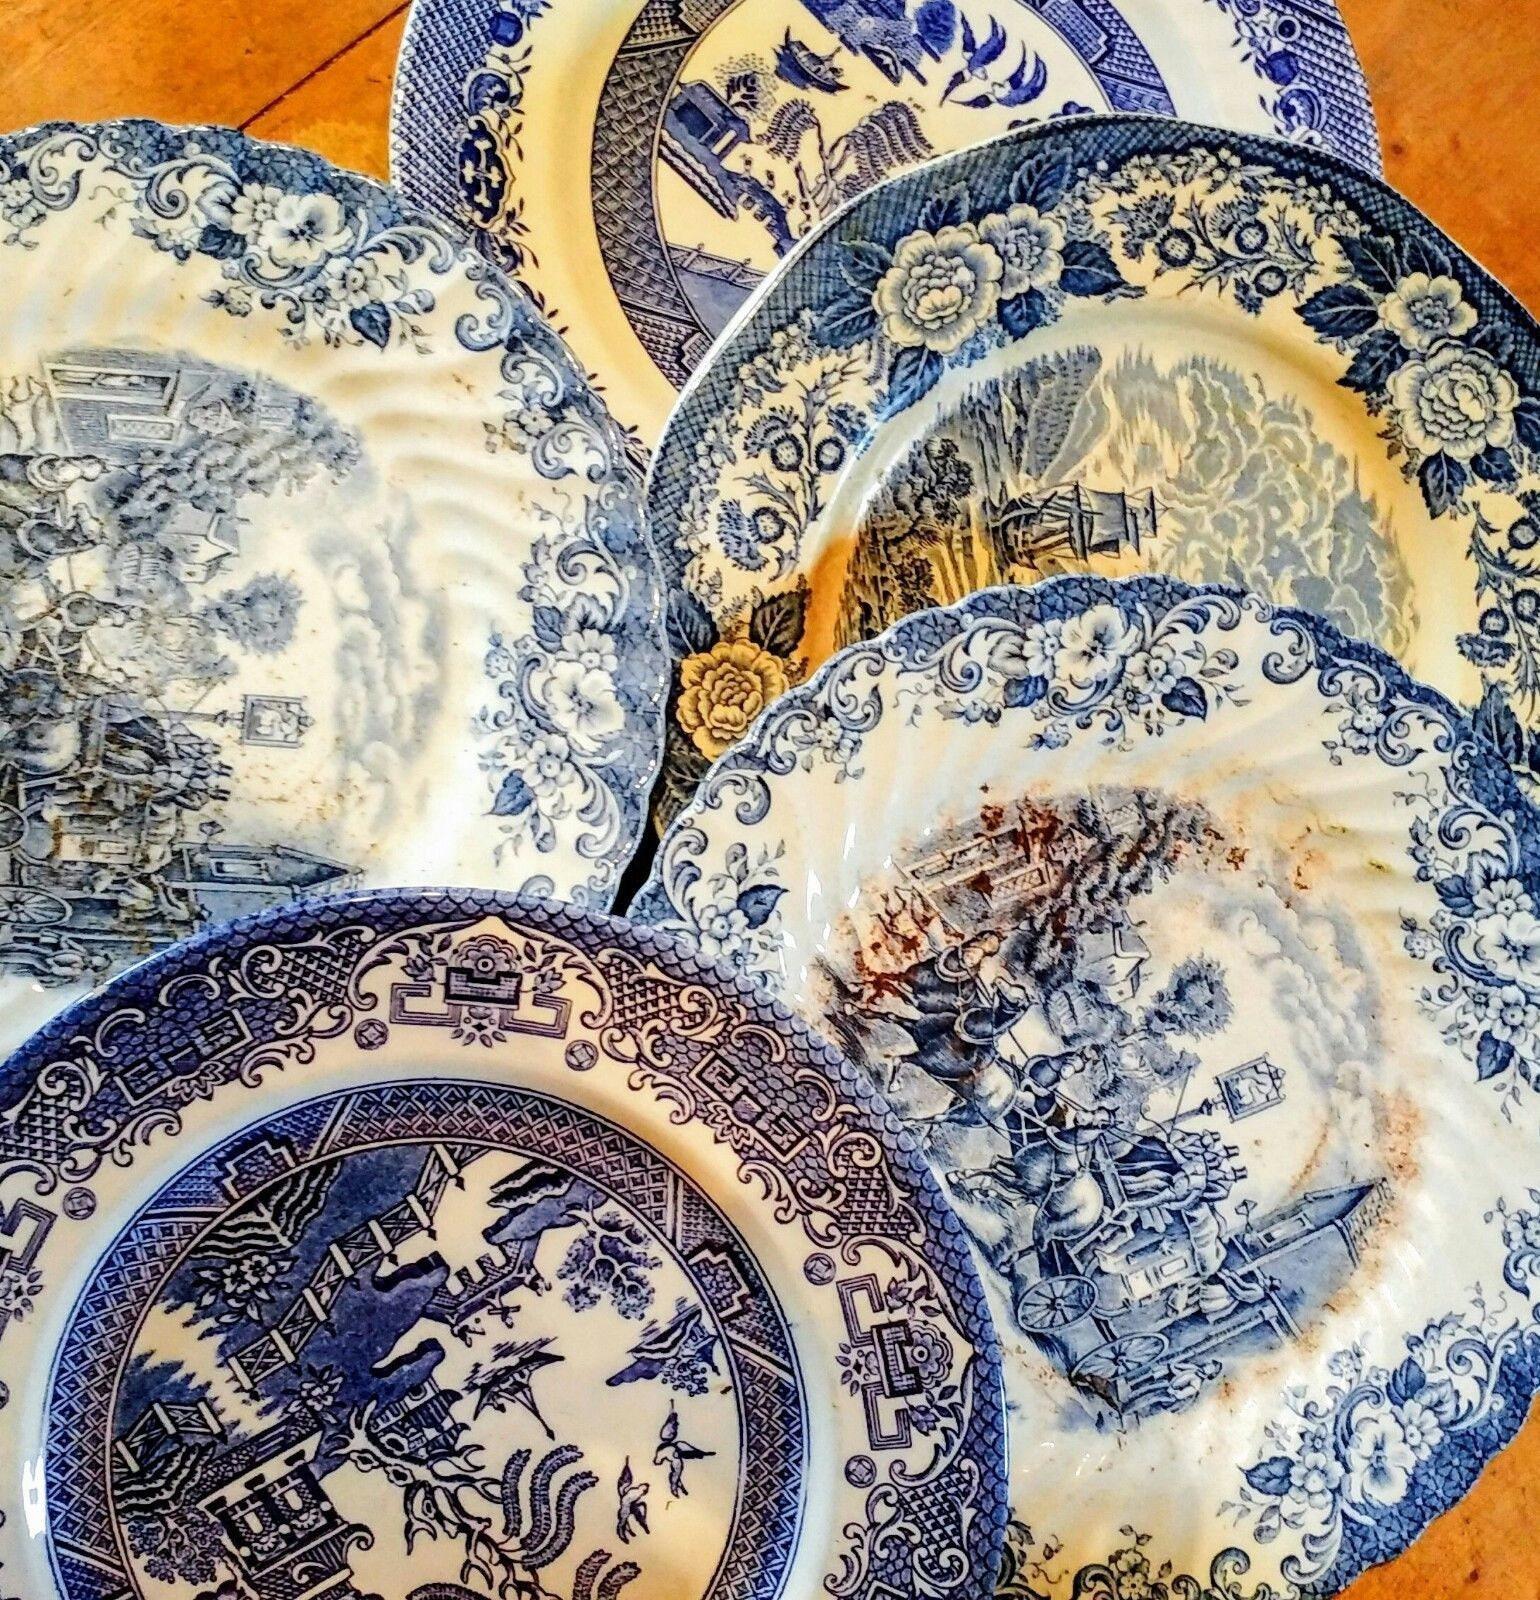 Job Lot Of 10 Vintage Mismatching Dinner Plates Tea Parties Weddings